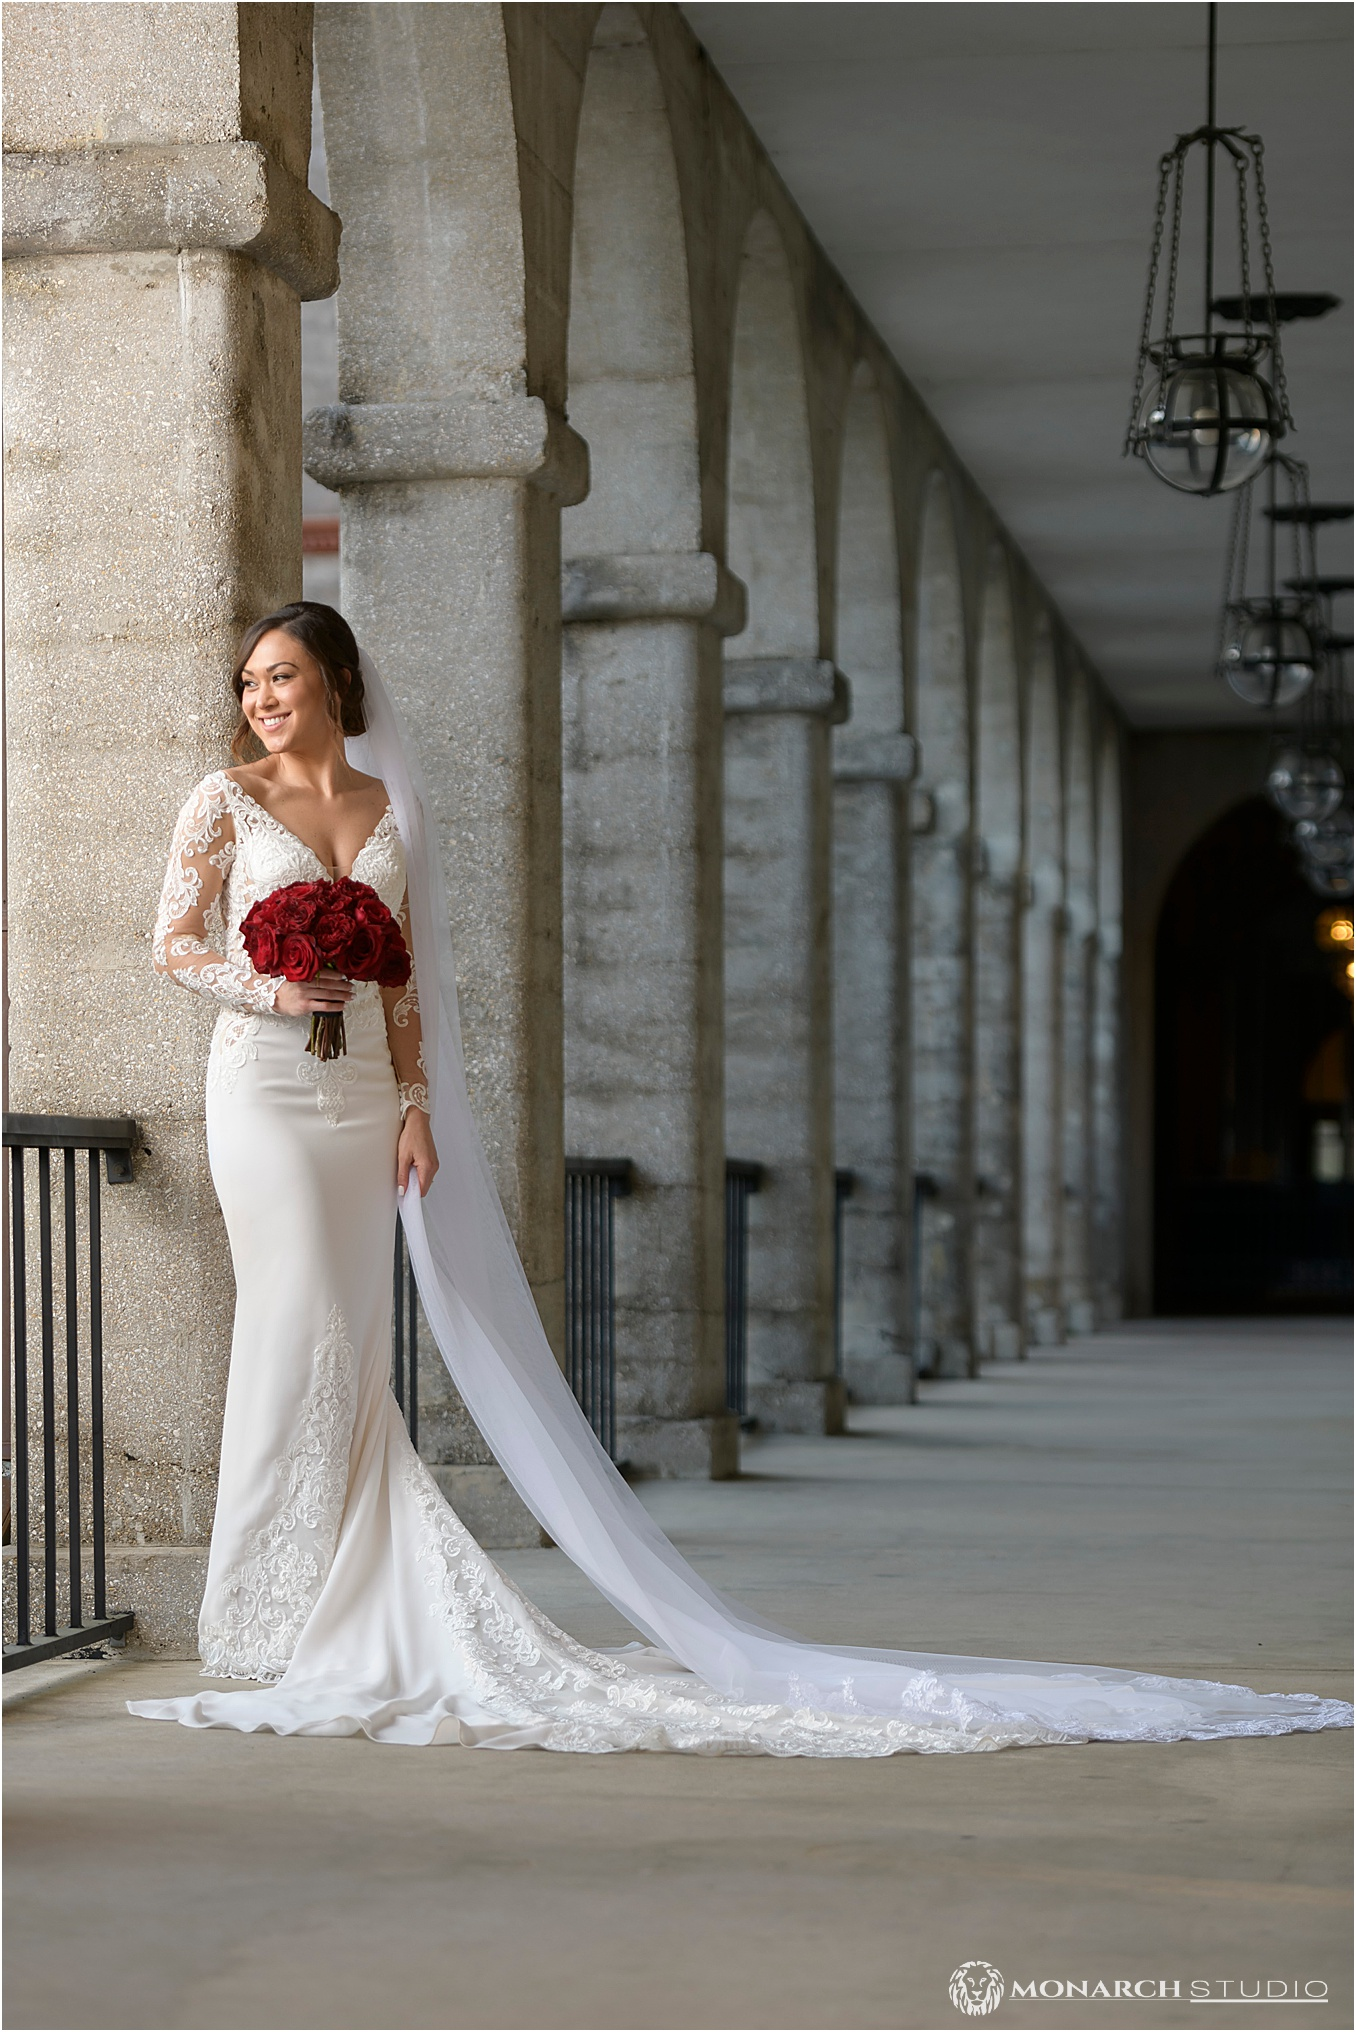 st-augustine-high-end-wedding-photographers-086.jpg